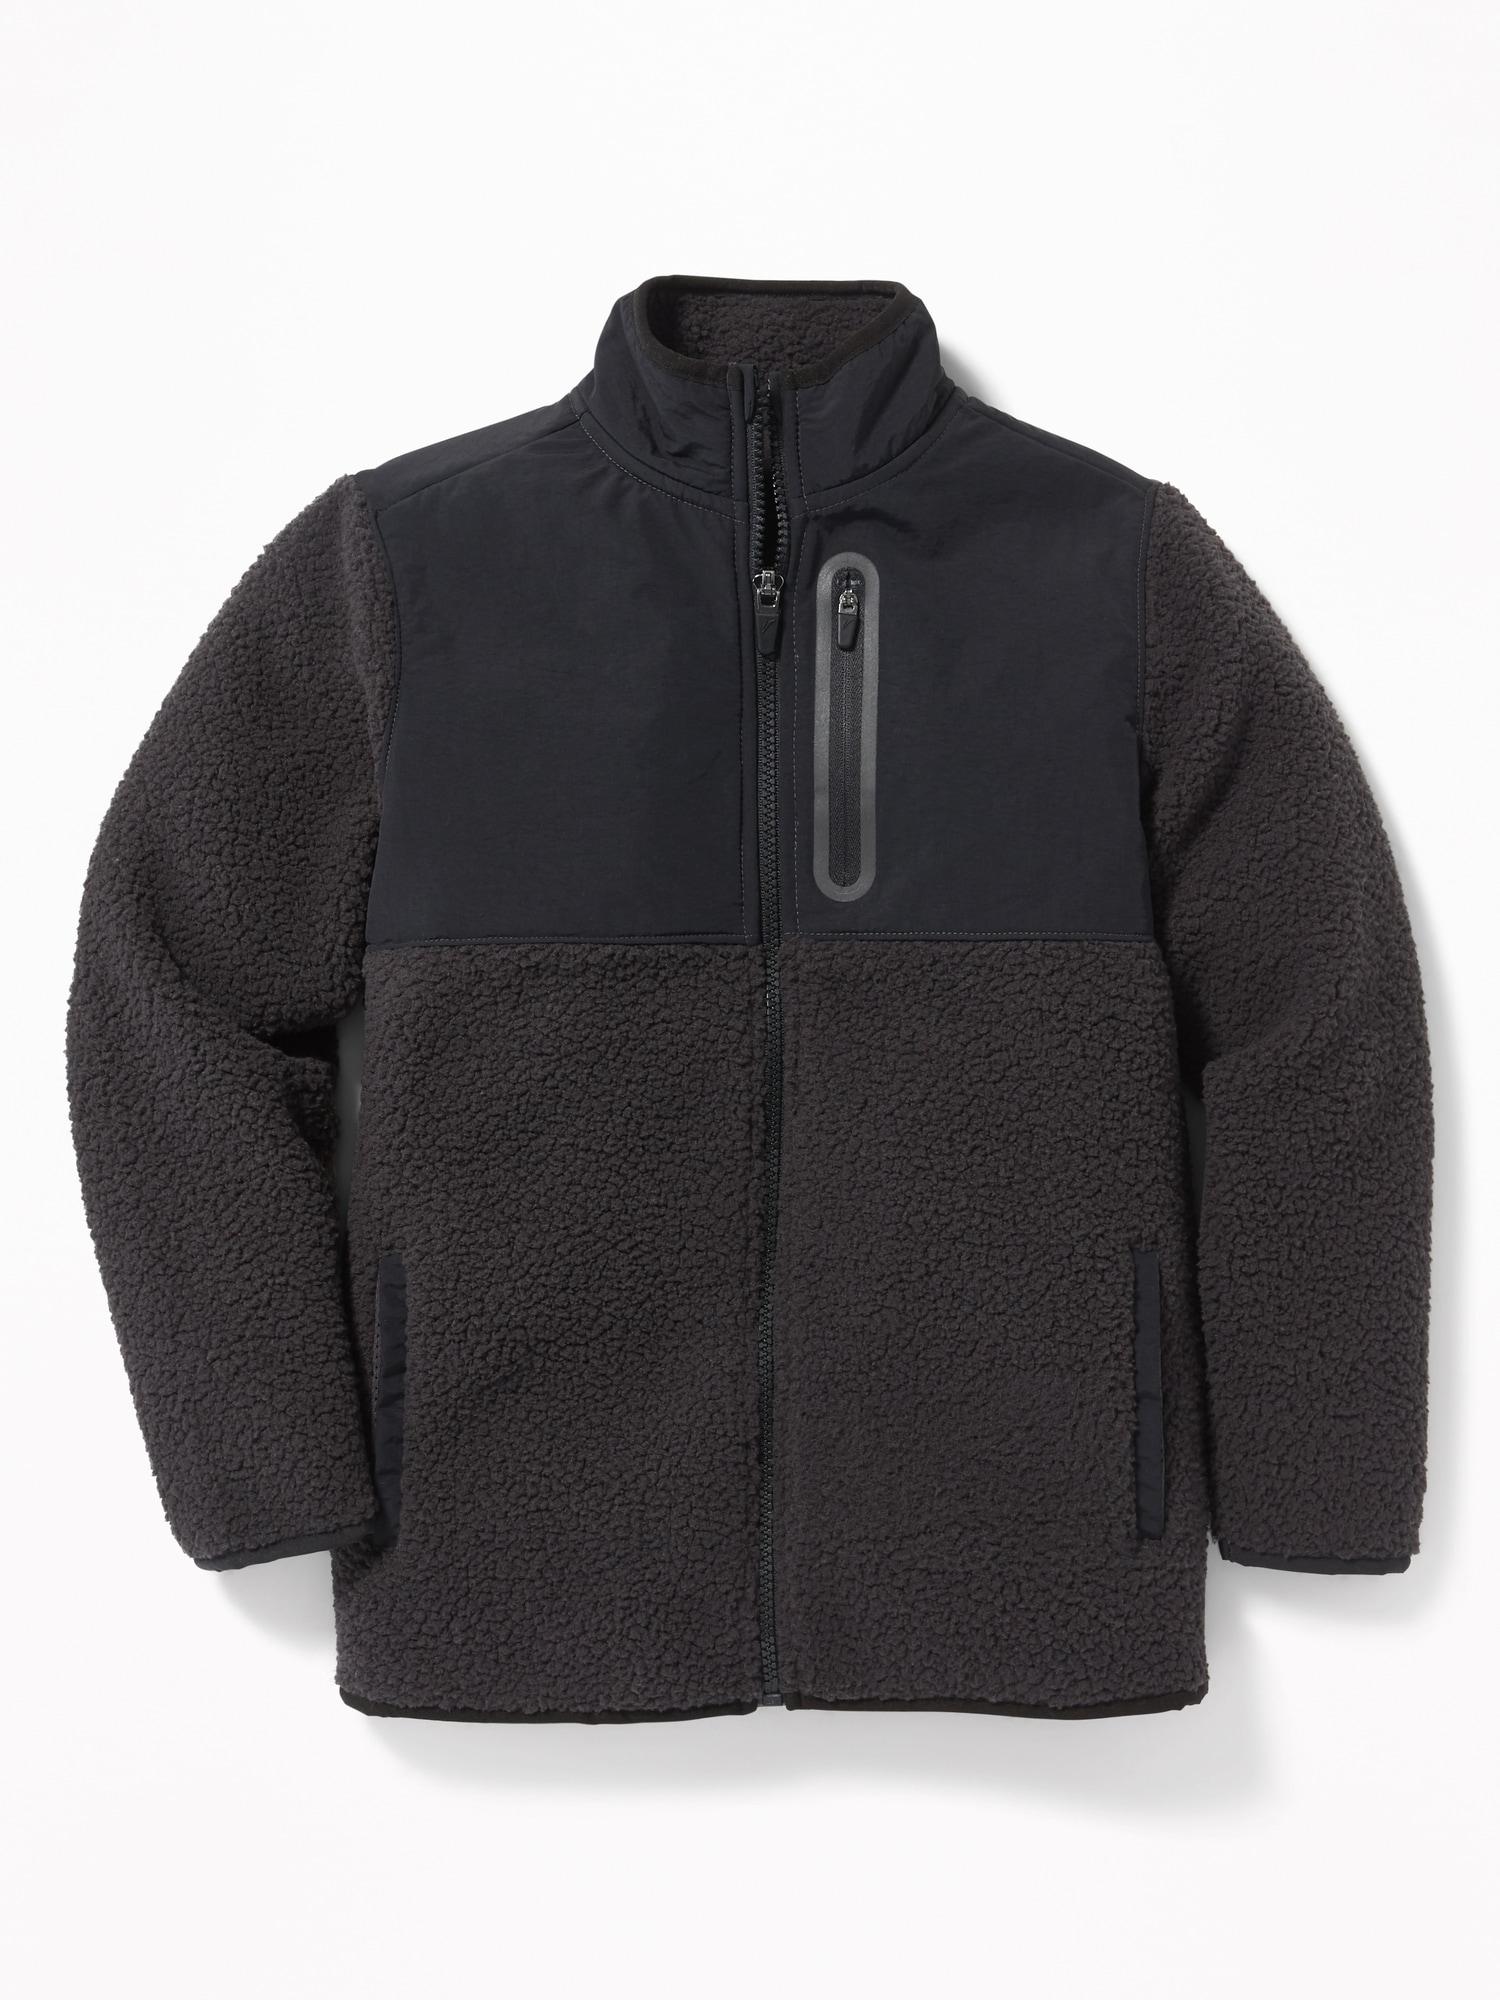 112278004 Go-Warm Color-Blocked Sherpa Zip Jacket for Boys